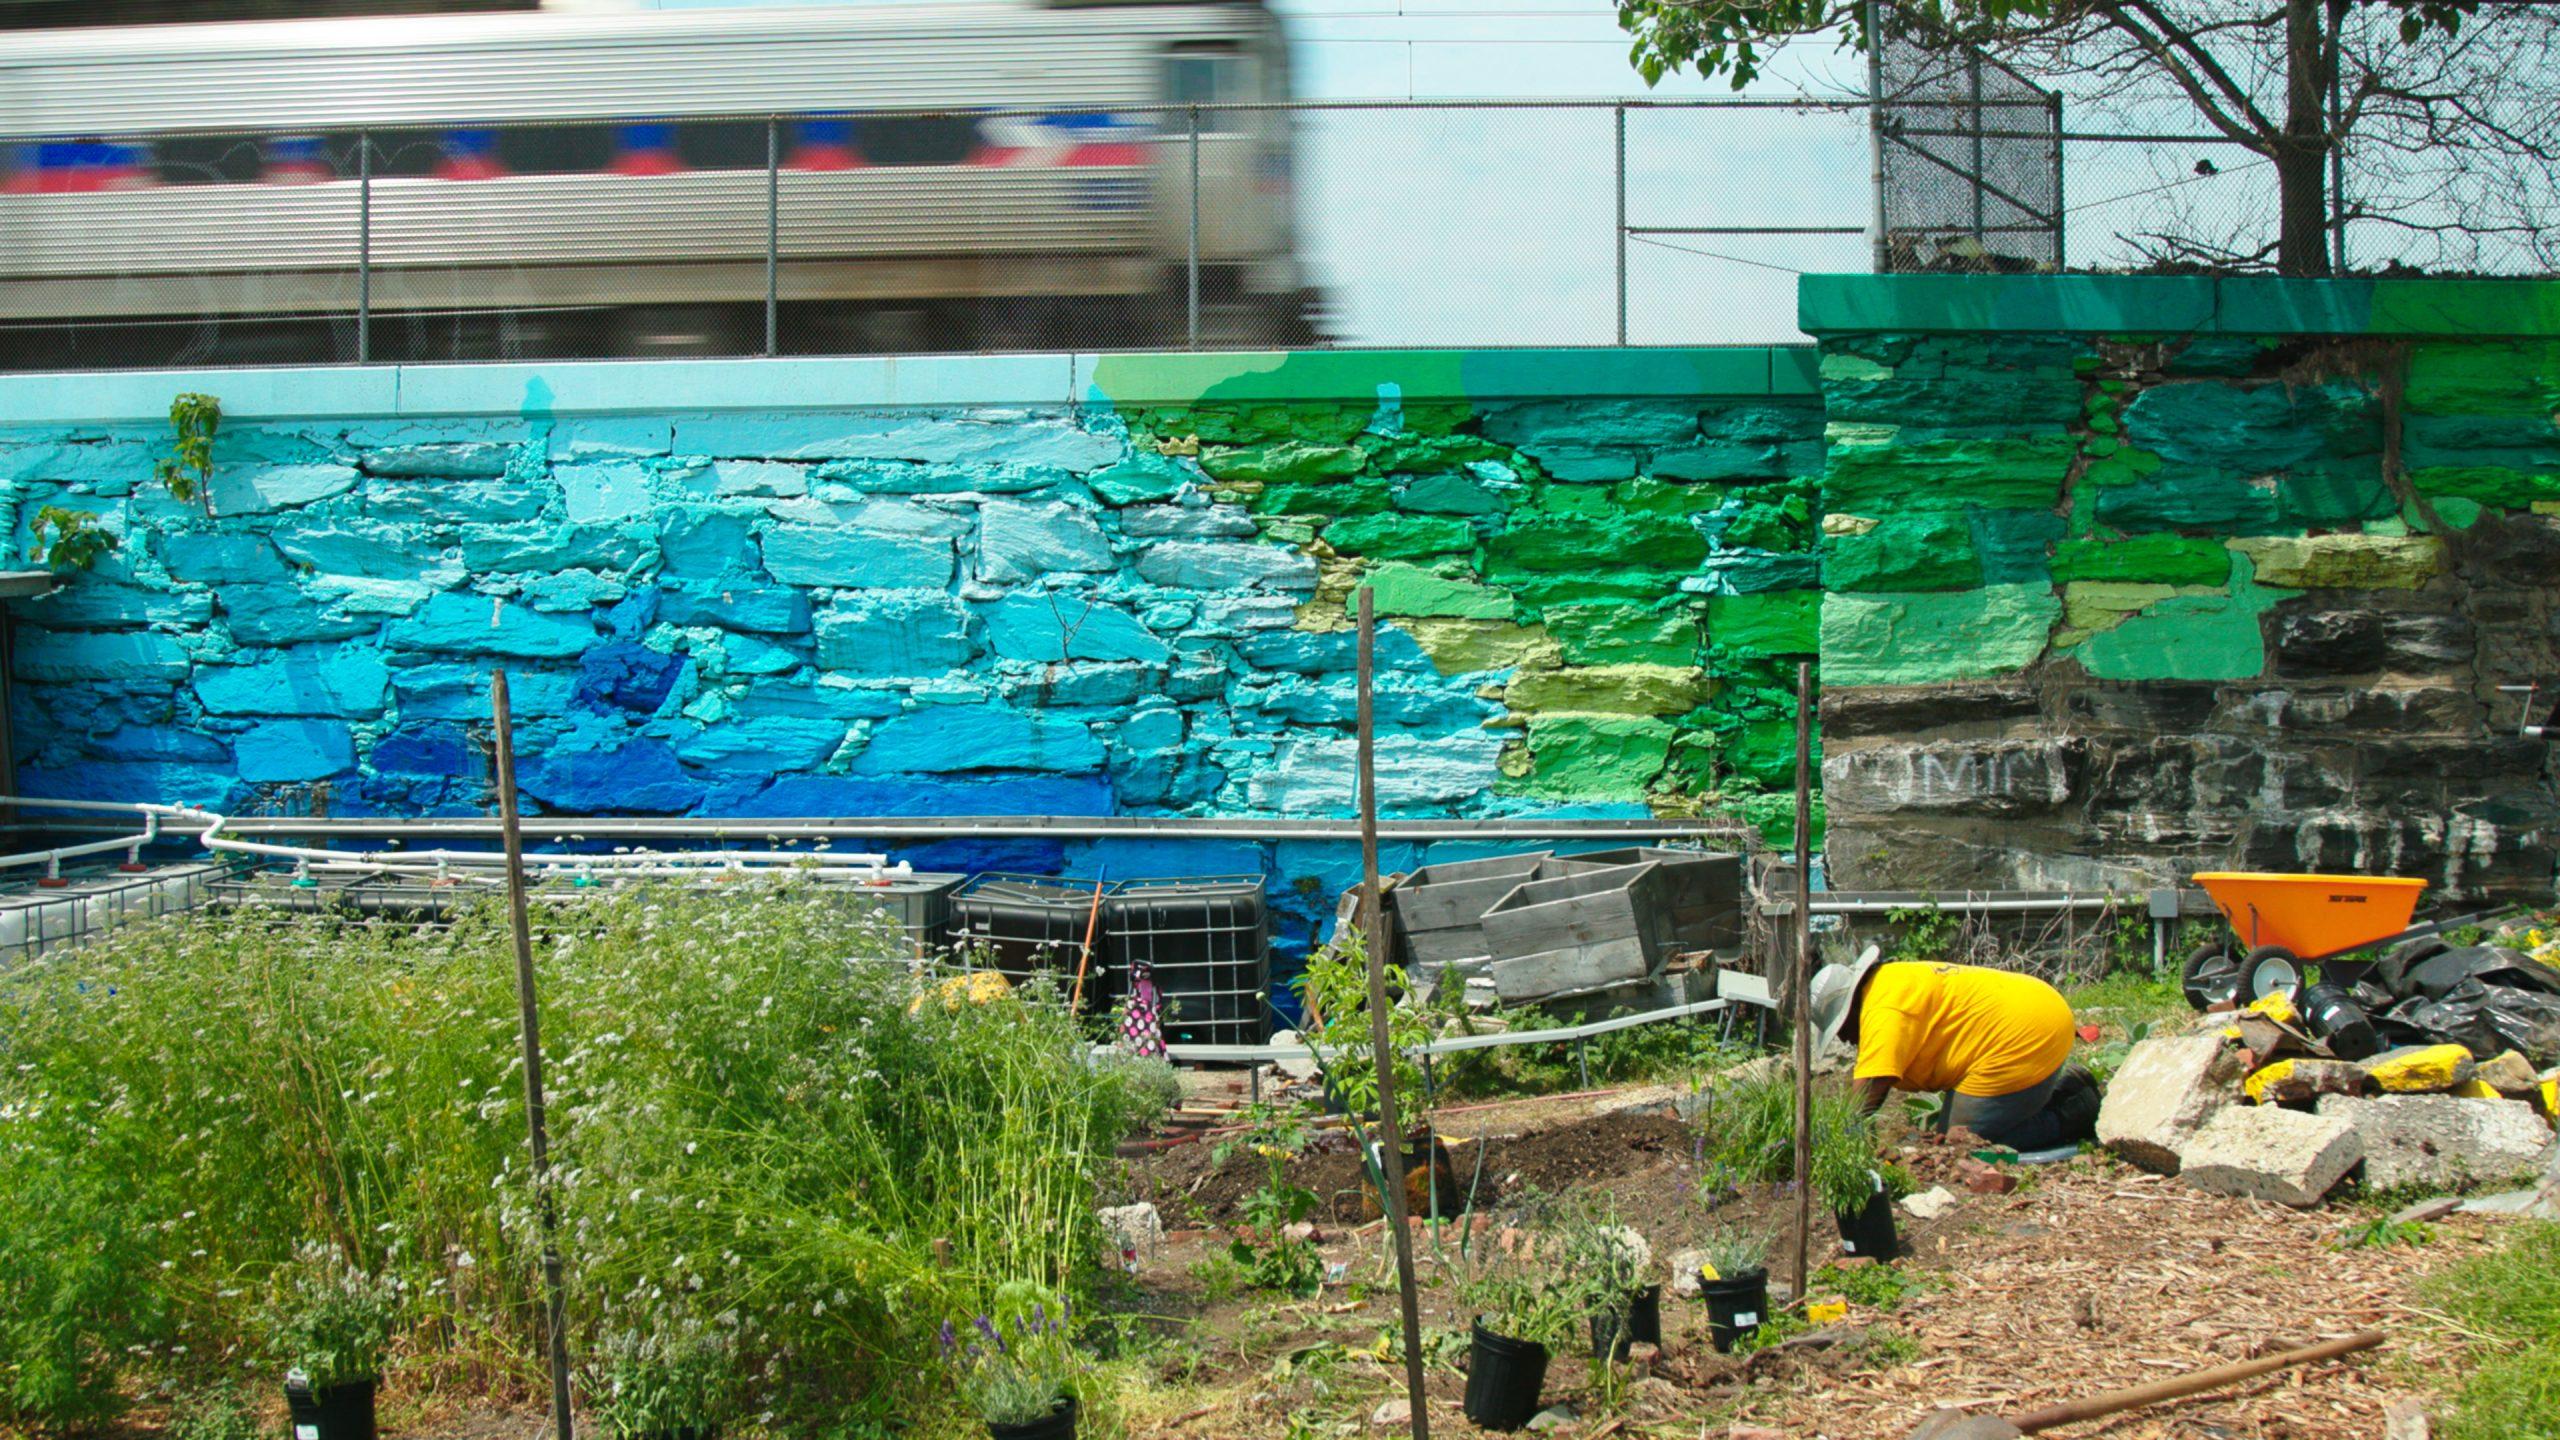 Succulent city film still of wall and garden